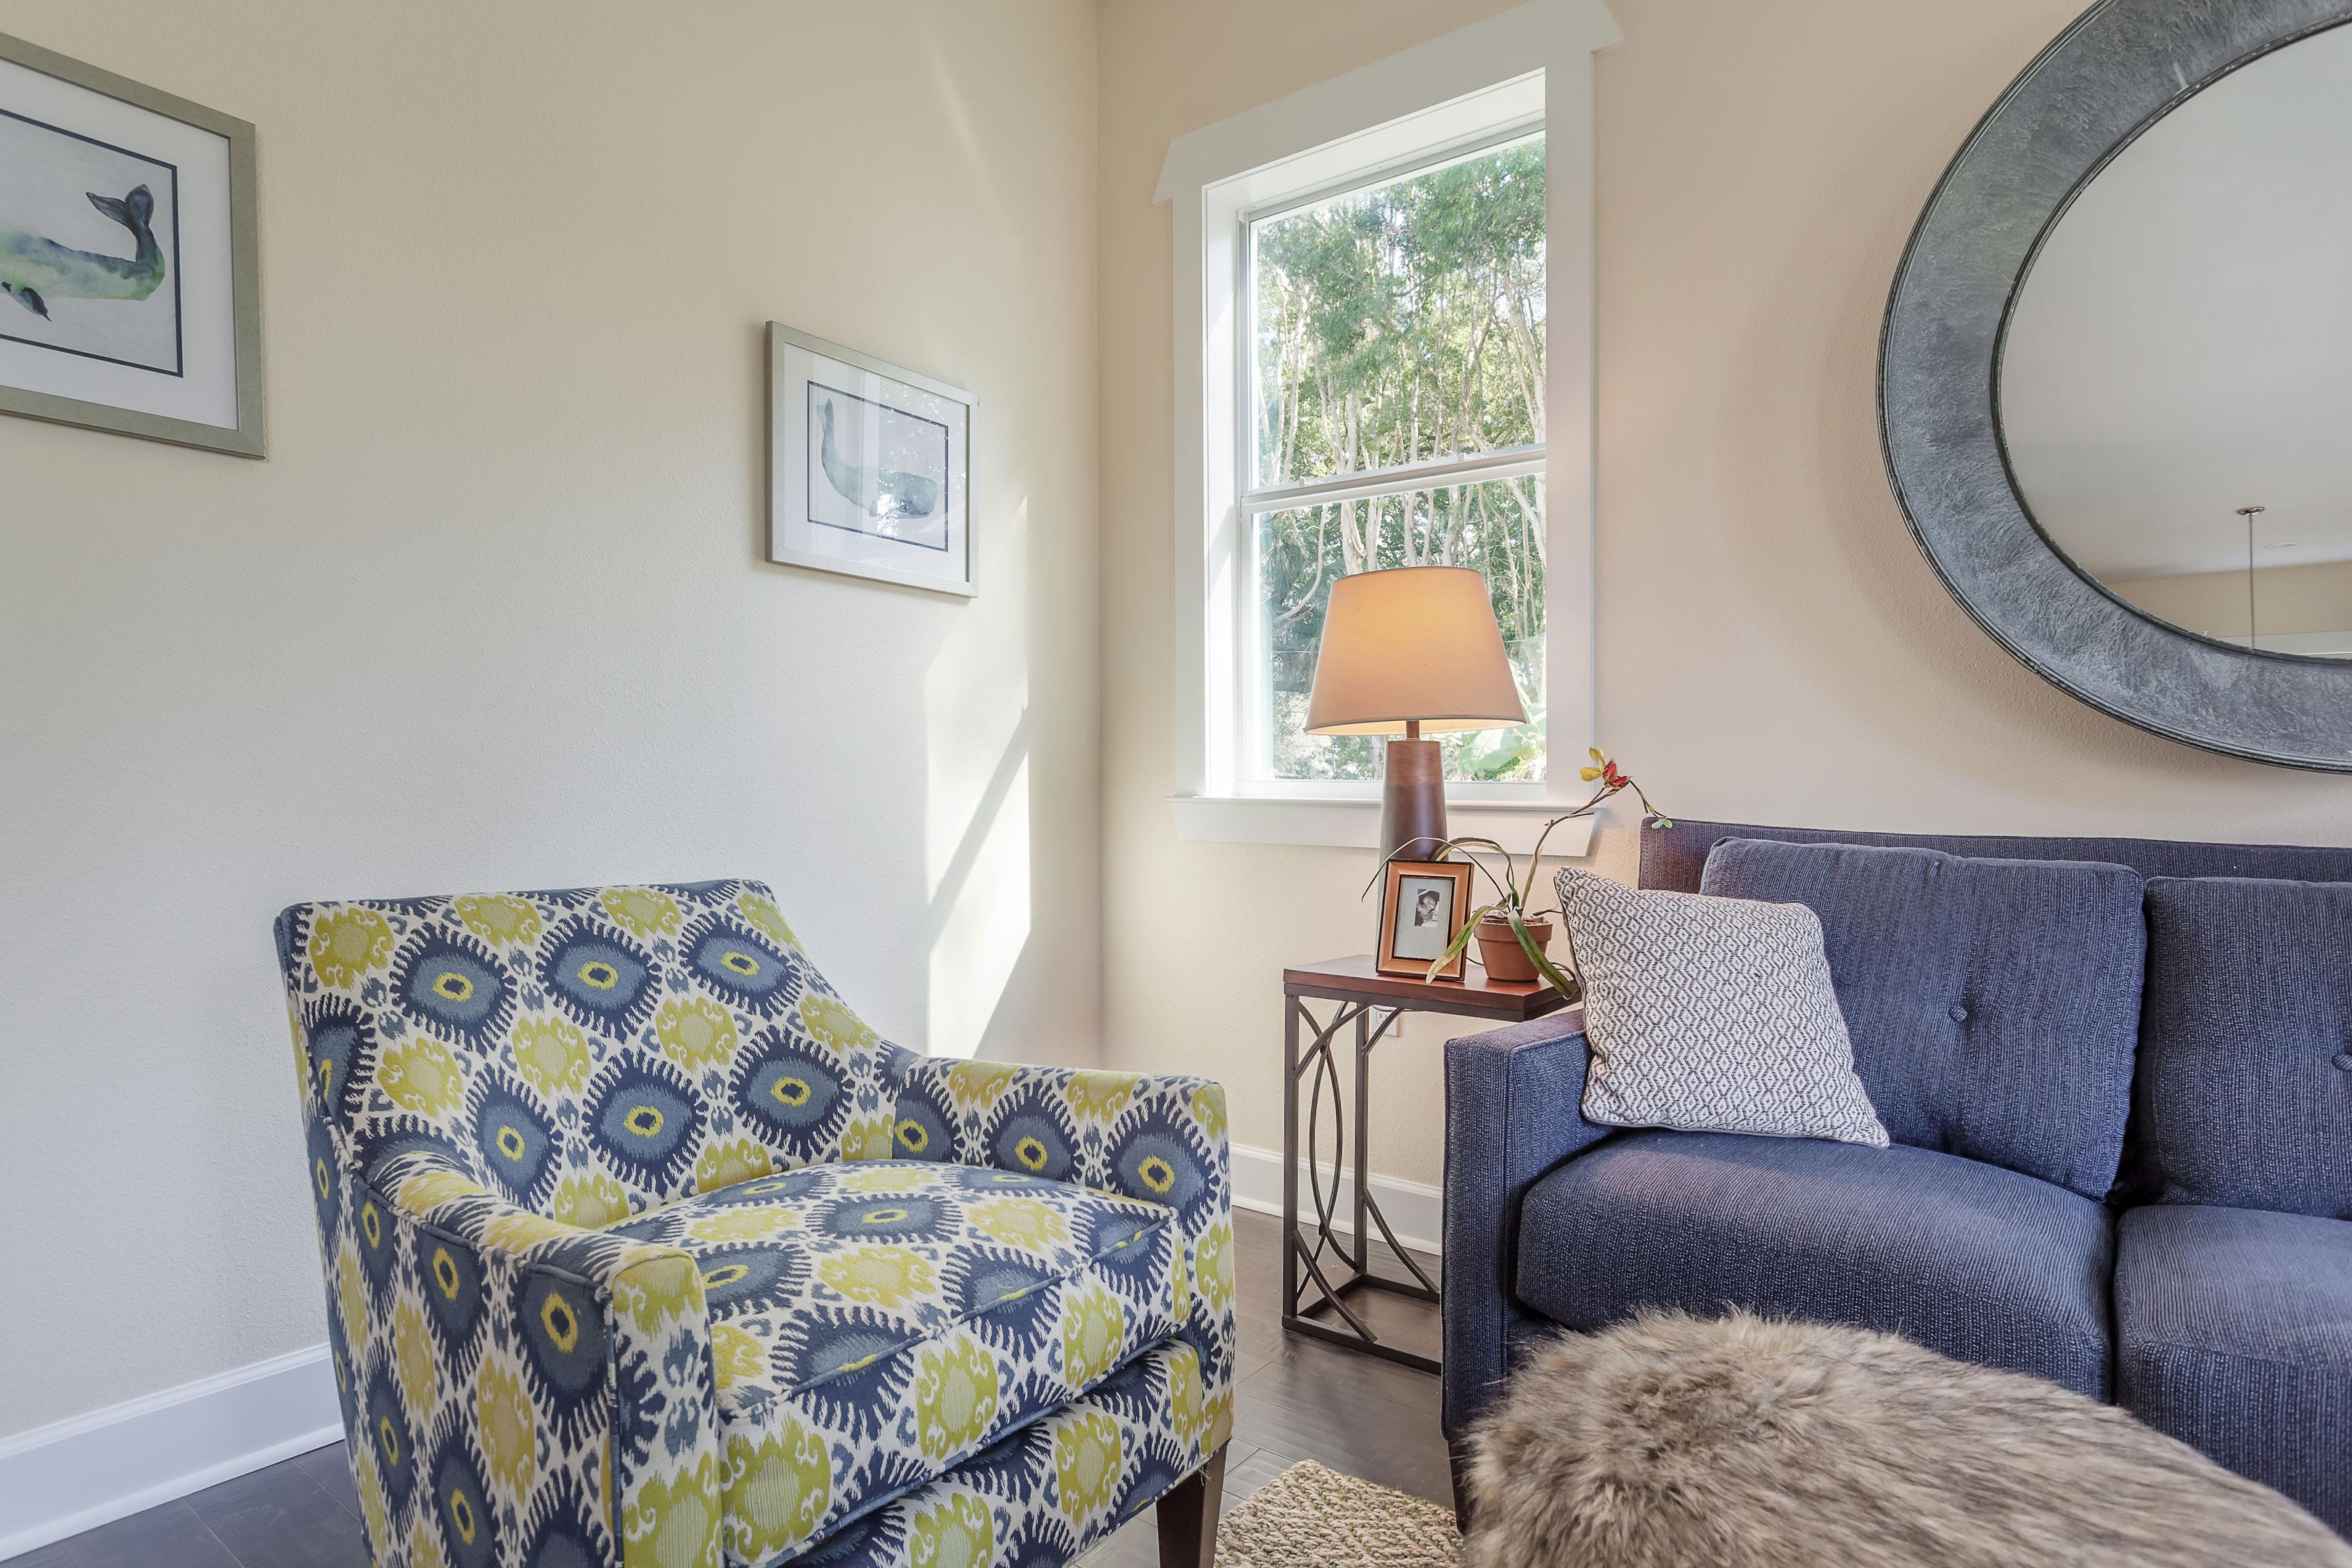 Coastally Modern Home Boasts Copious Windows And Juliette